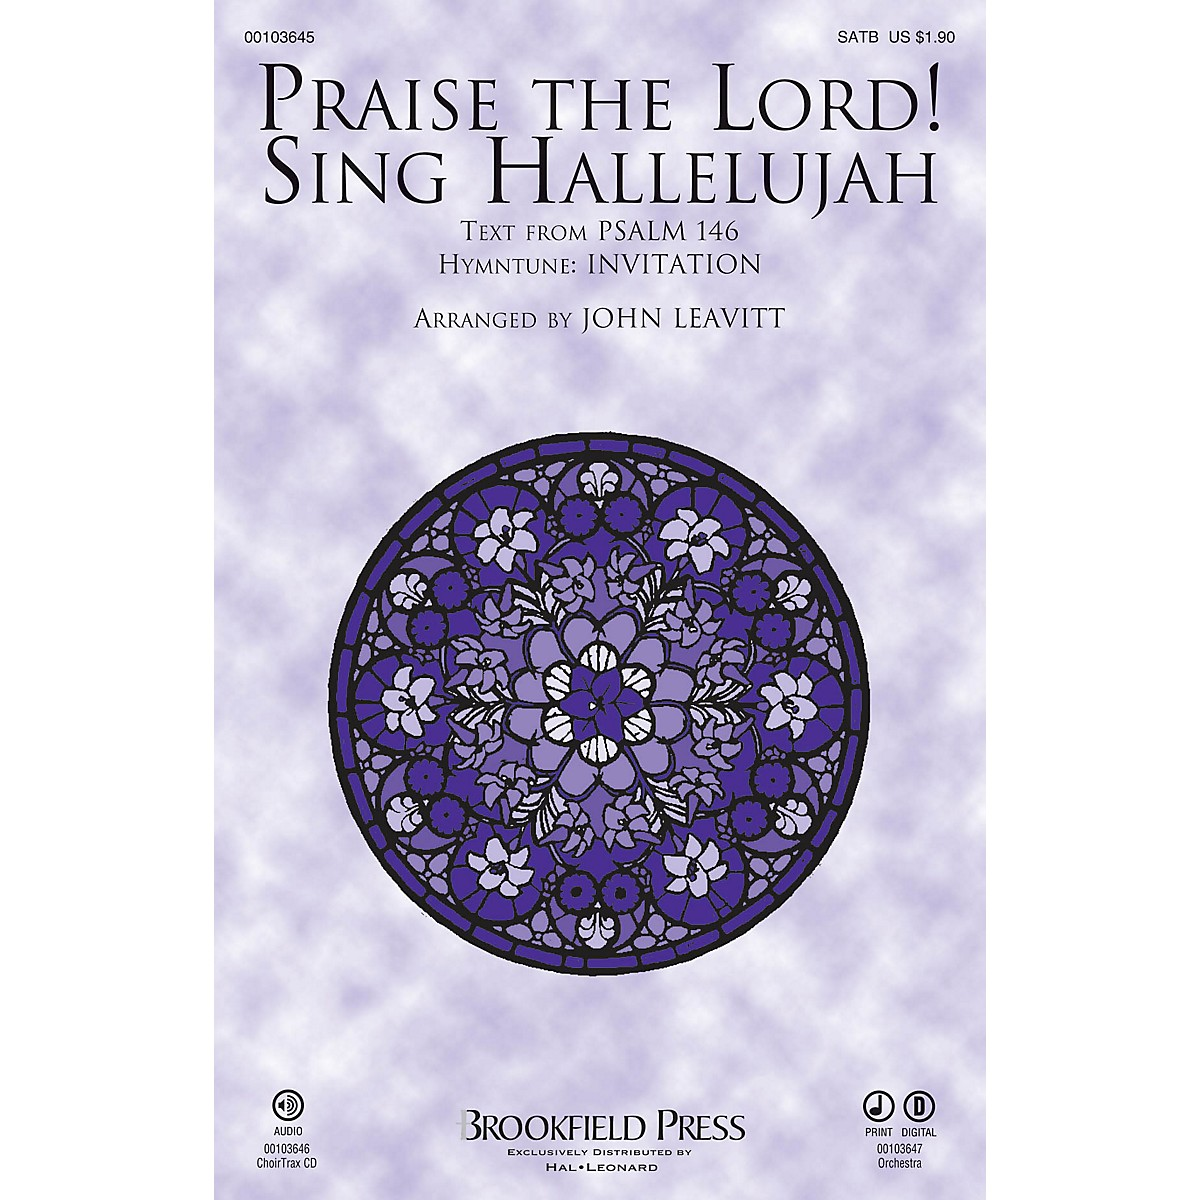 Brookfield Praise The Lord! Sing Hallelujah SATB arranged by John Leavitt